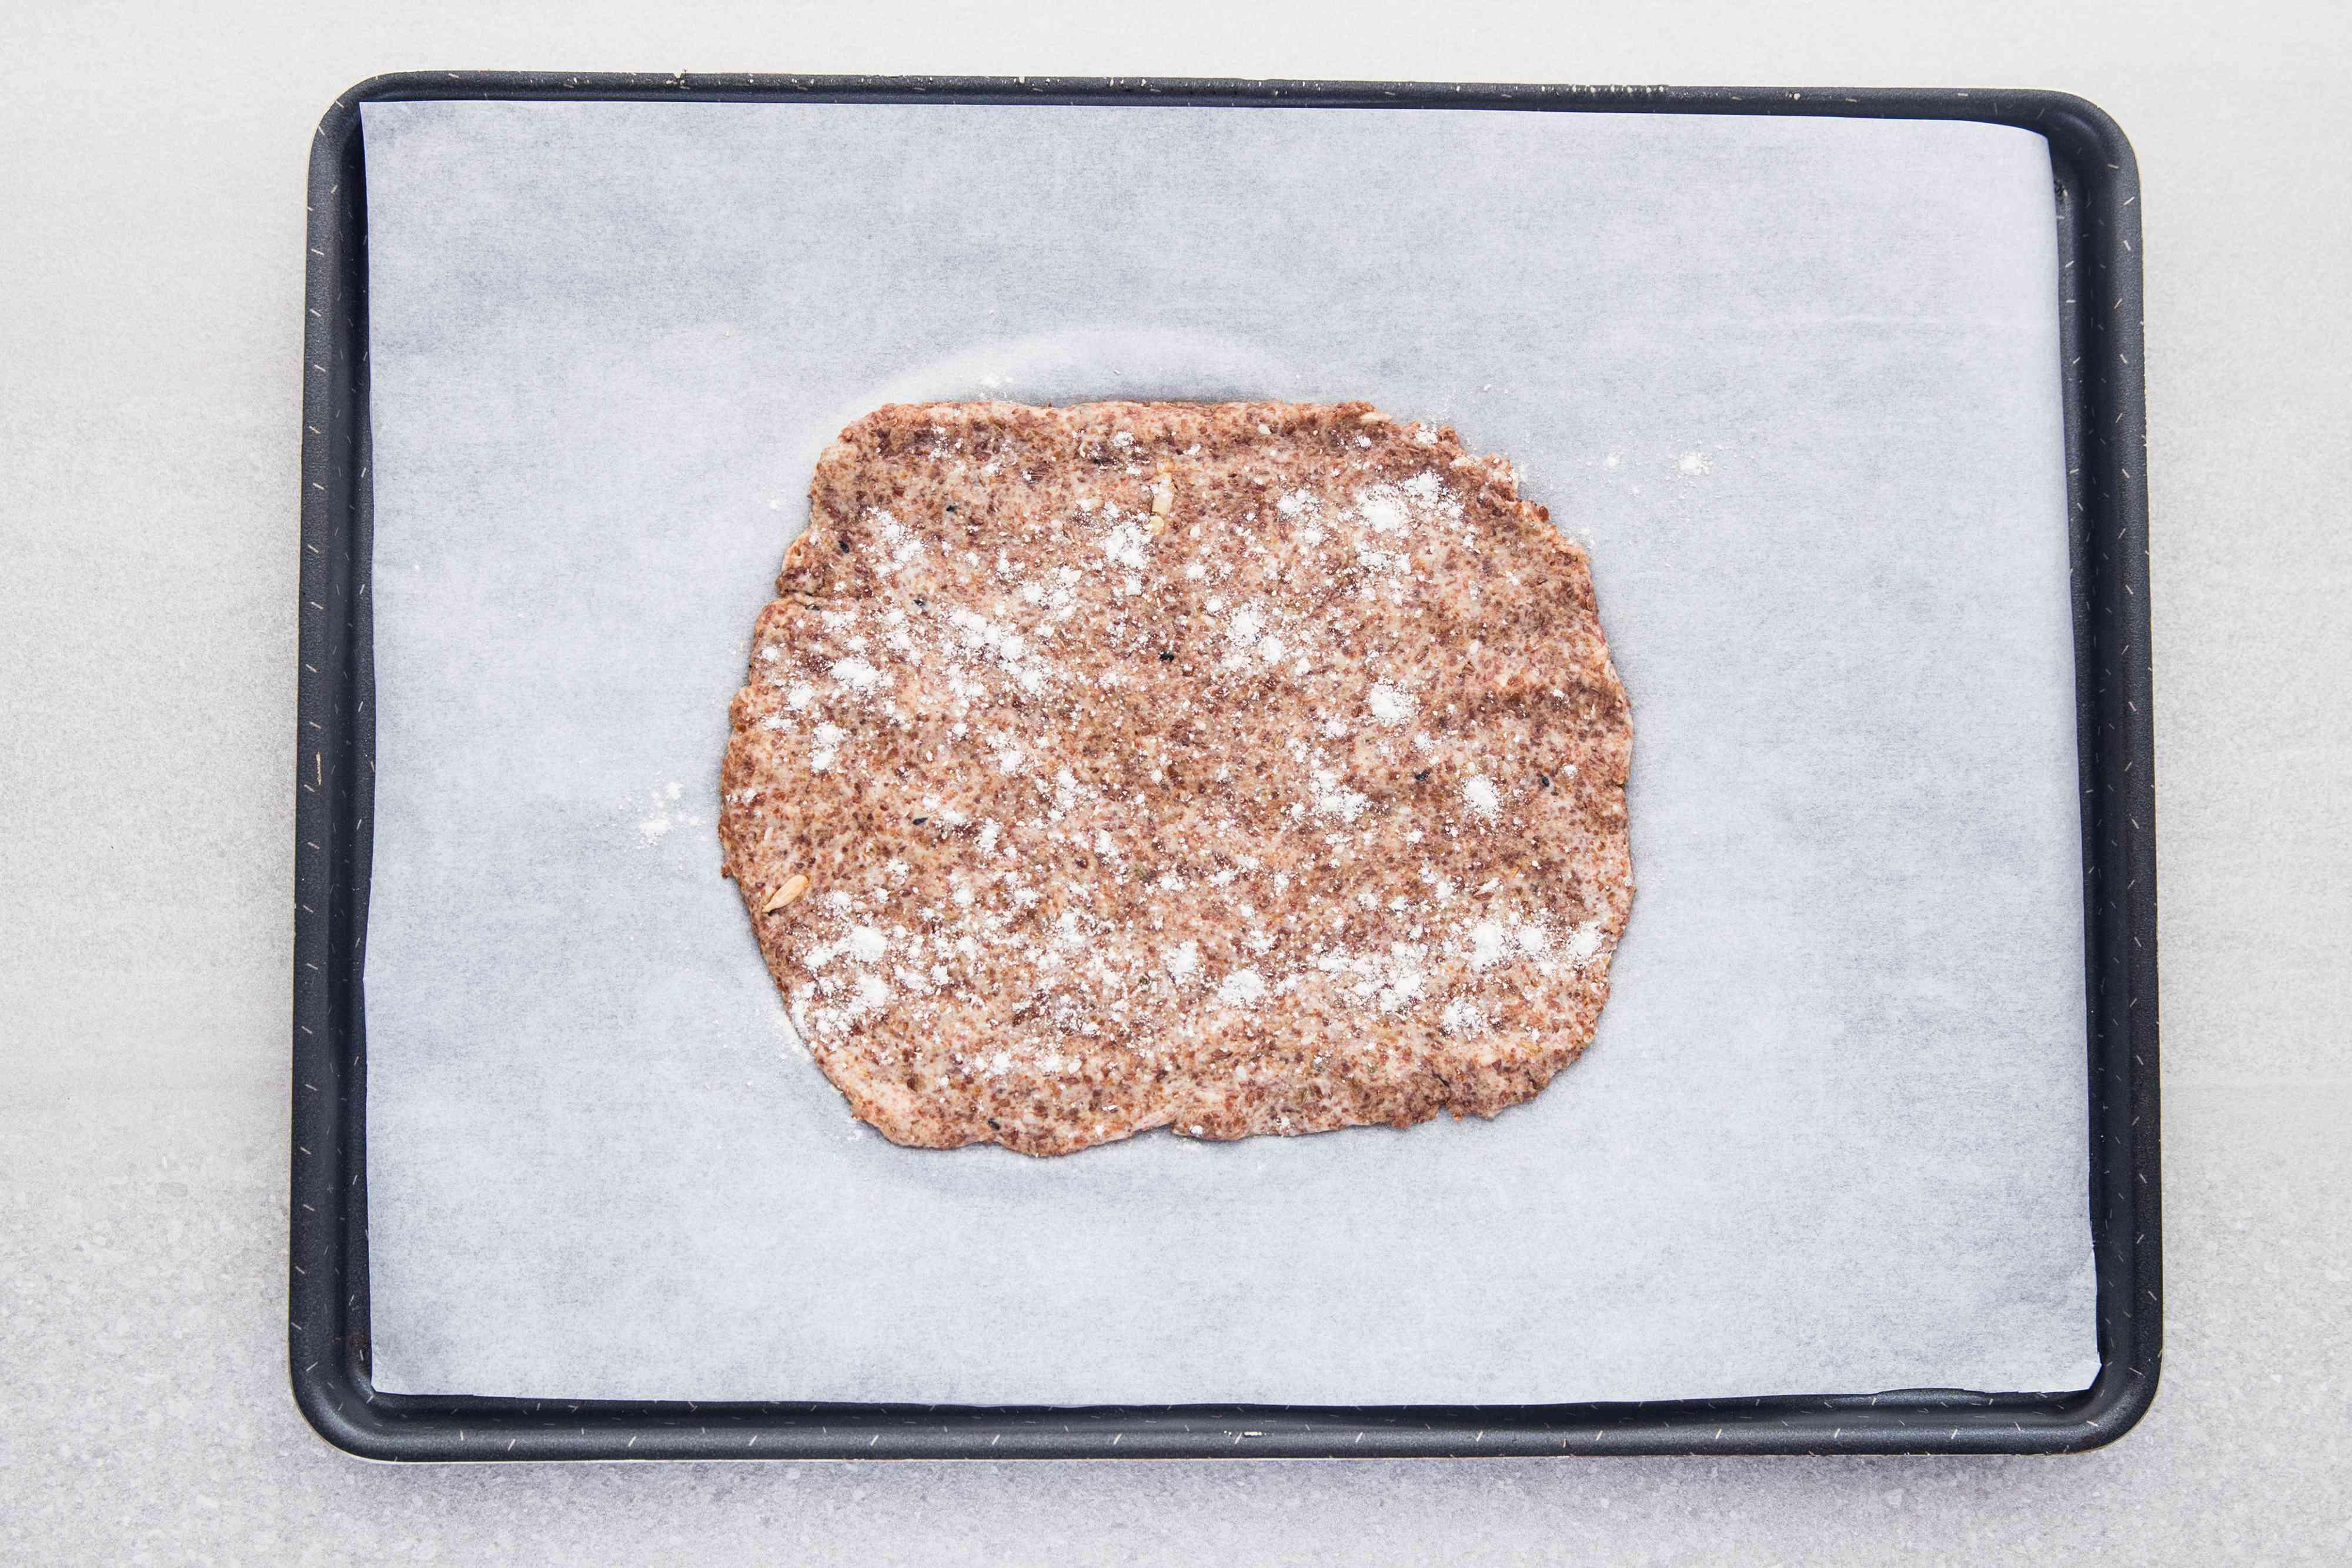 Cracker dough with flour on top on a baking sheet